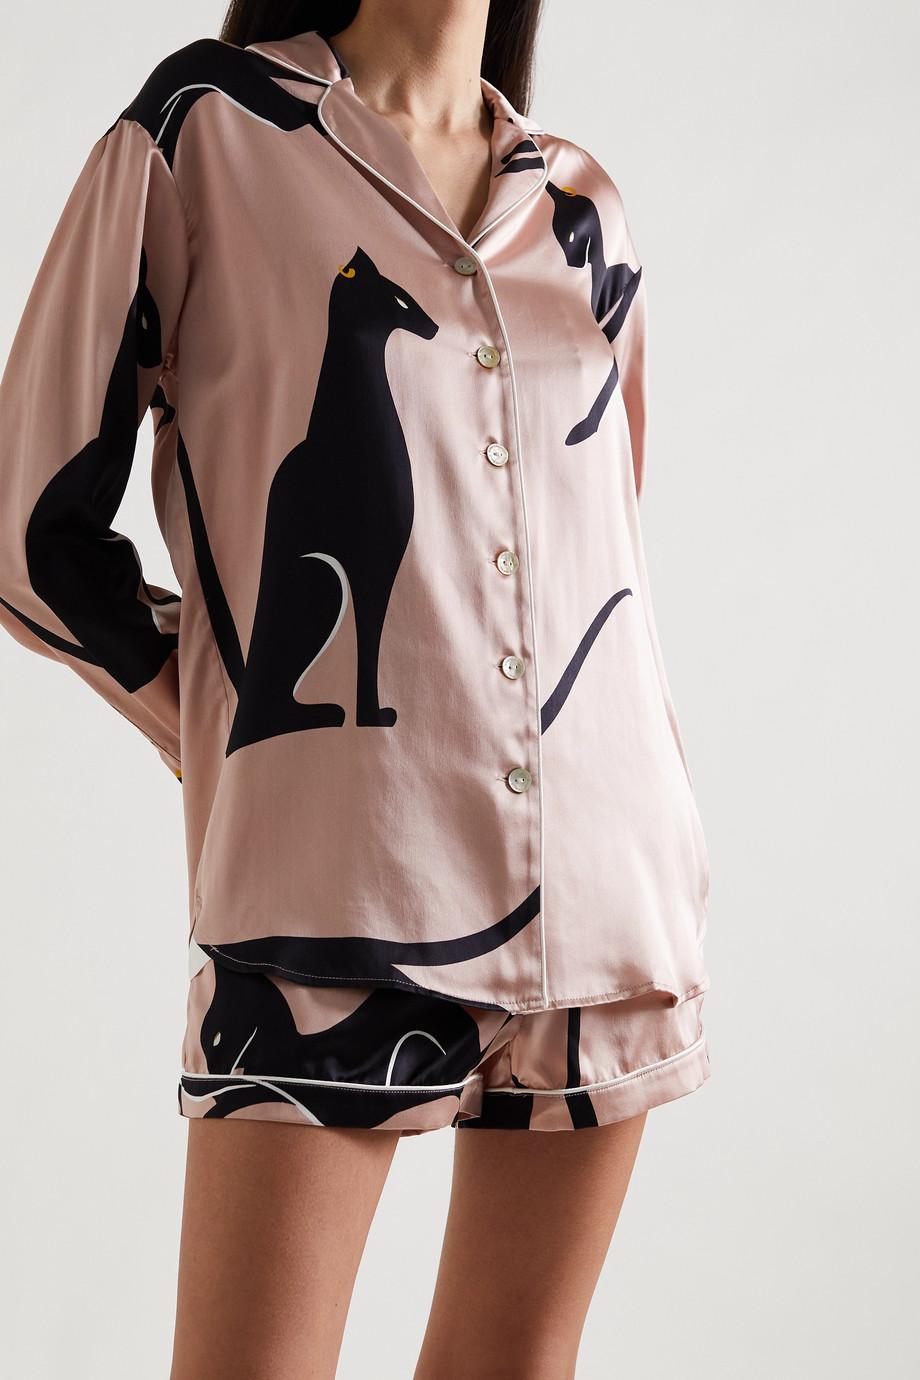 Olivia von Halle Alba bedruckter Pyjama aus Seidensatin mit Paspeln